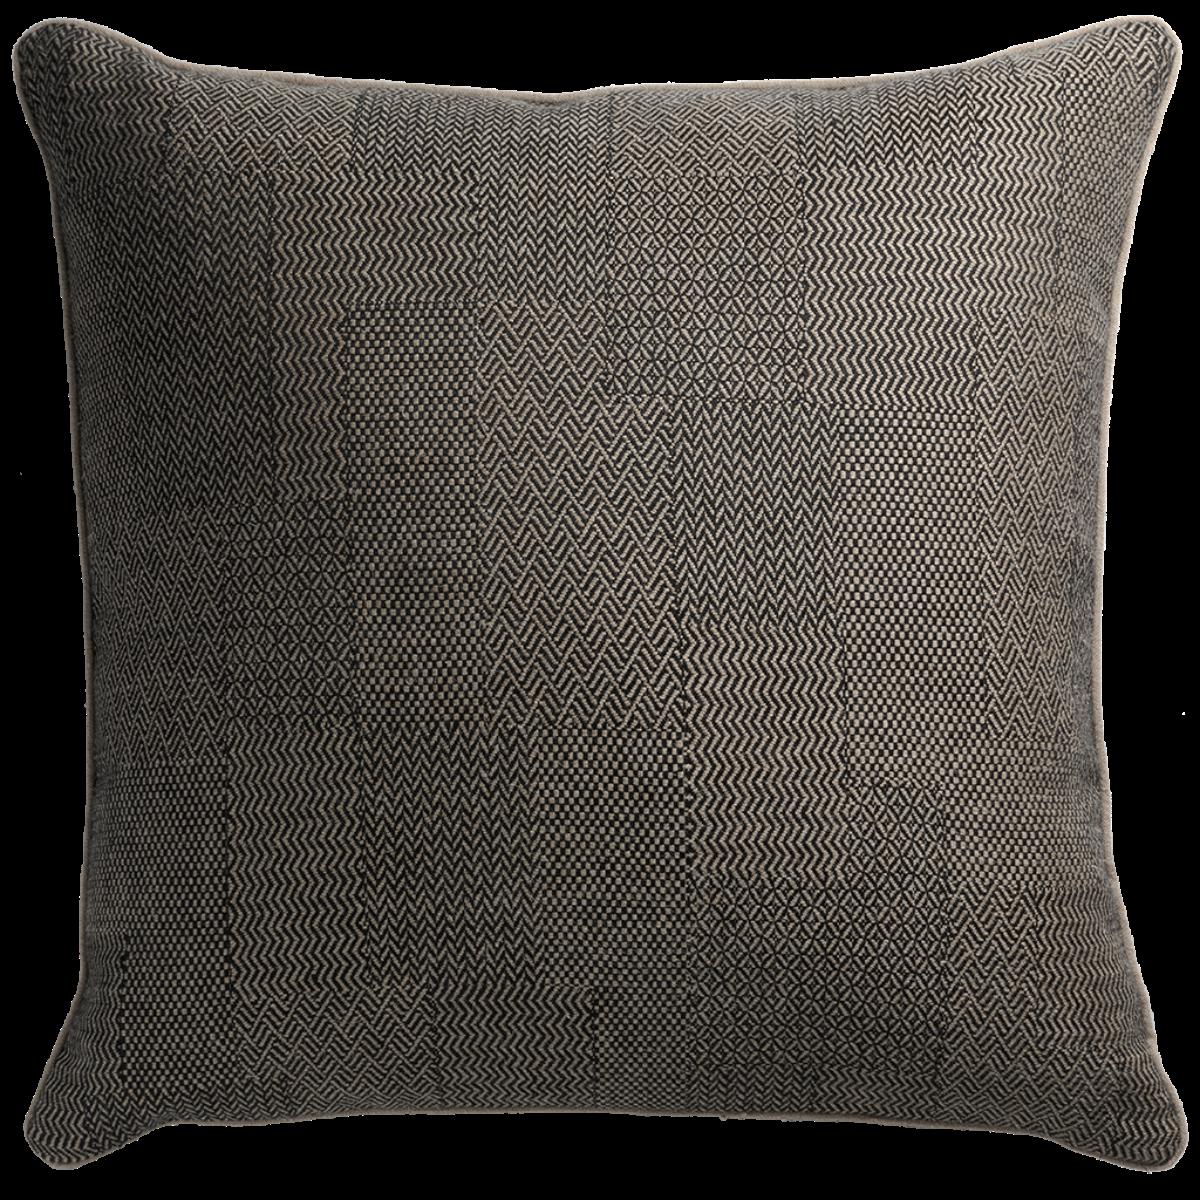 de Le Cuona | Hawker Cushion With Piping Carbon